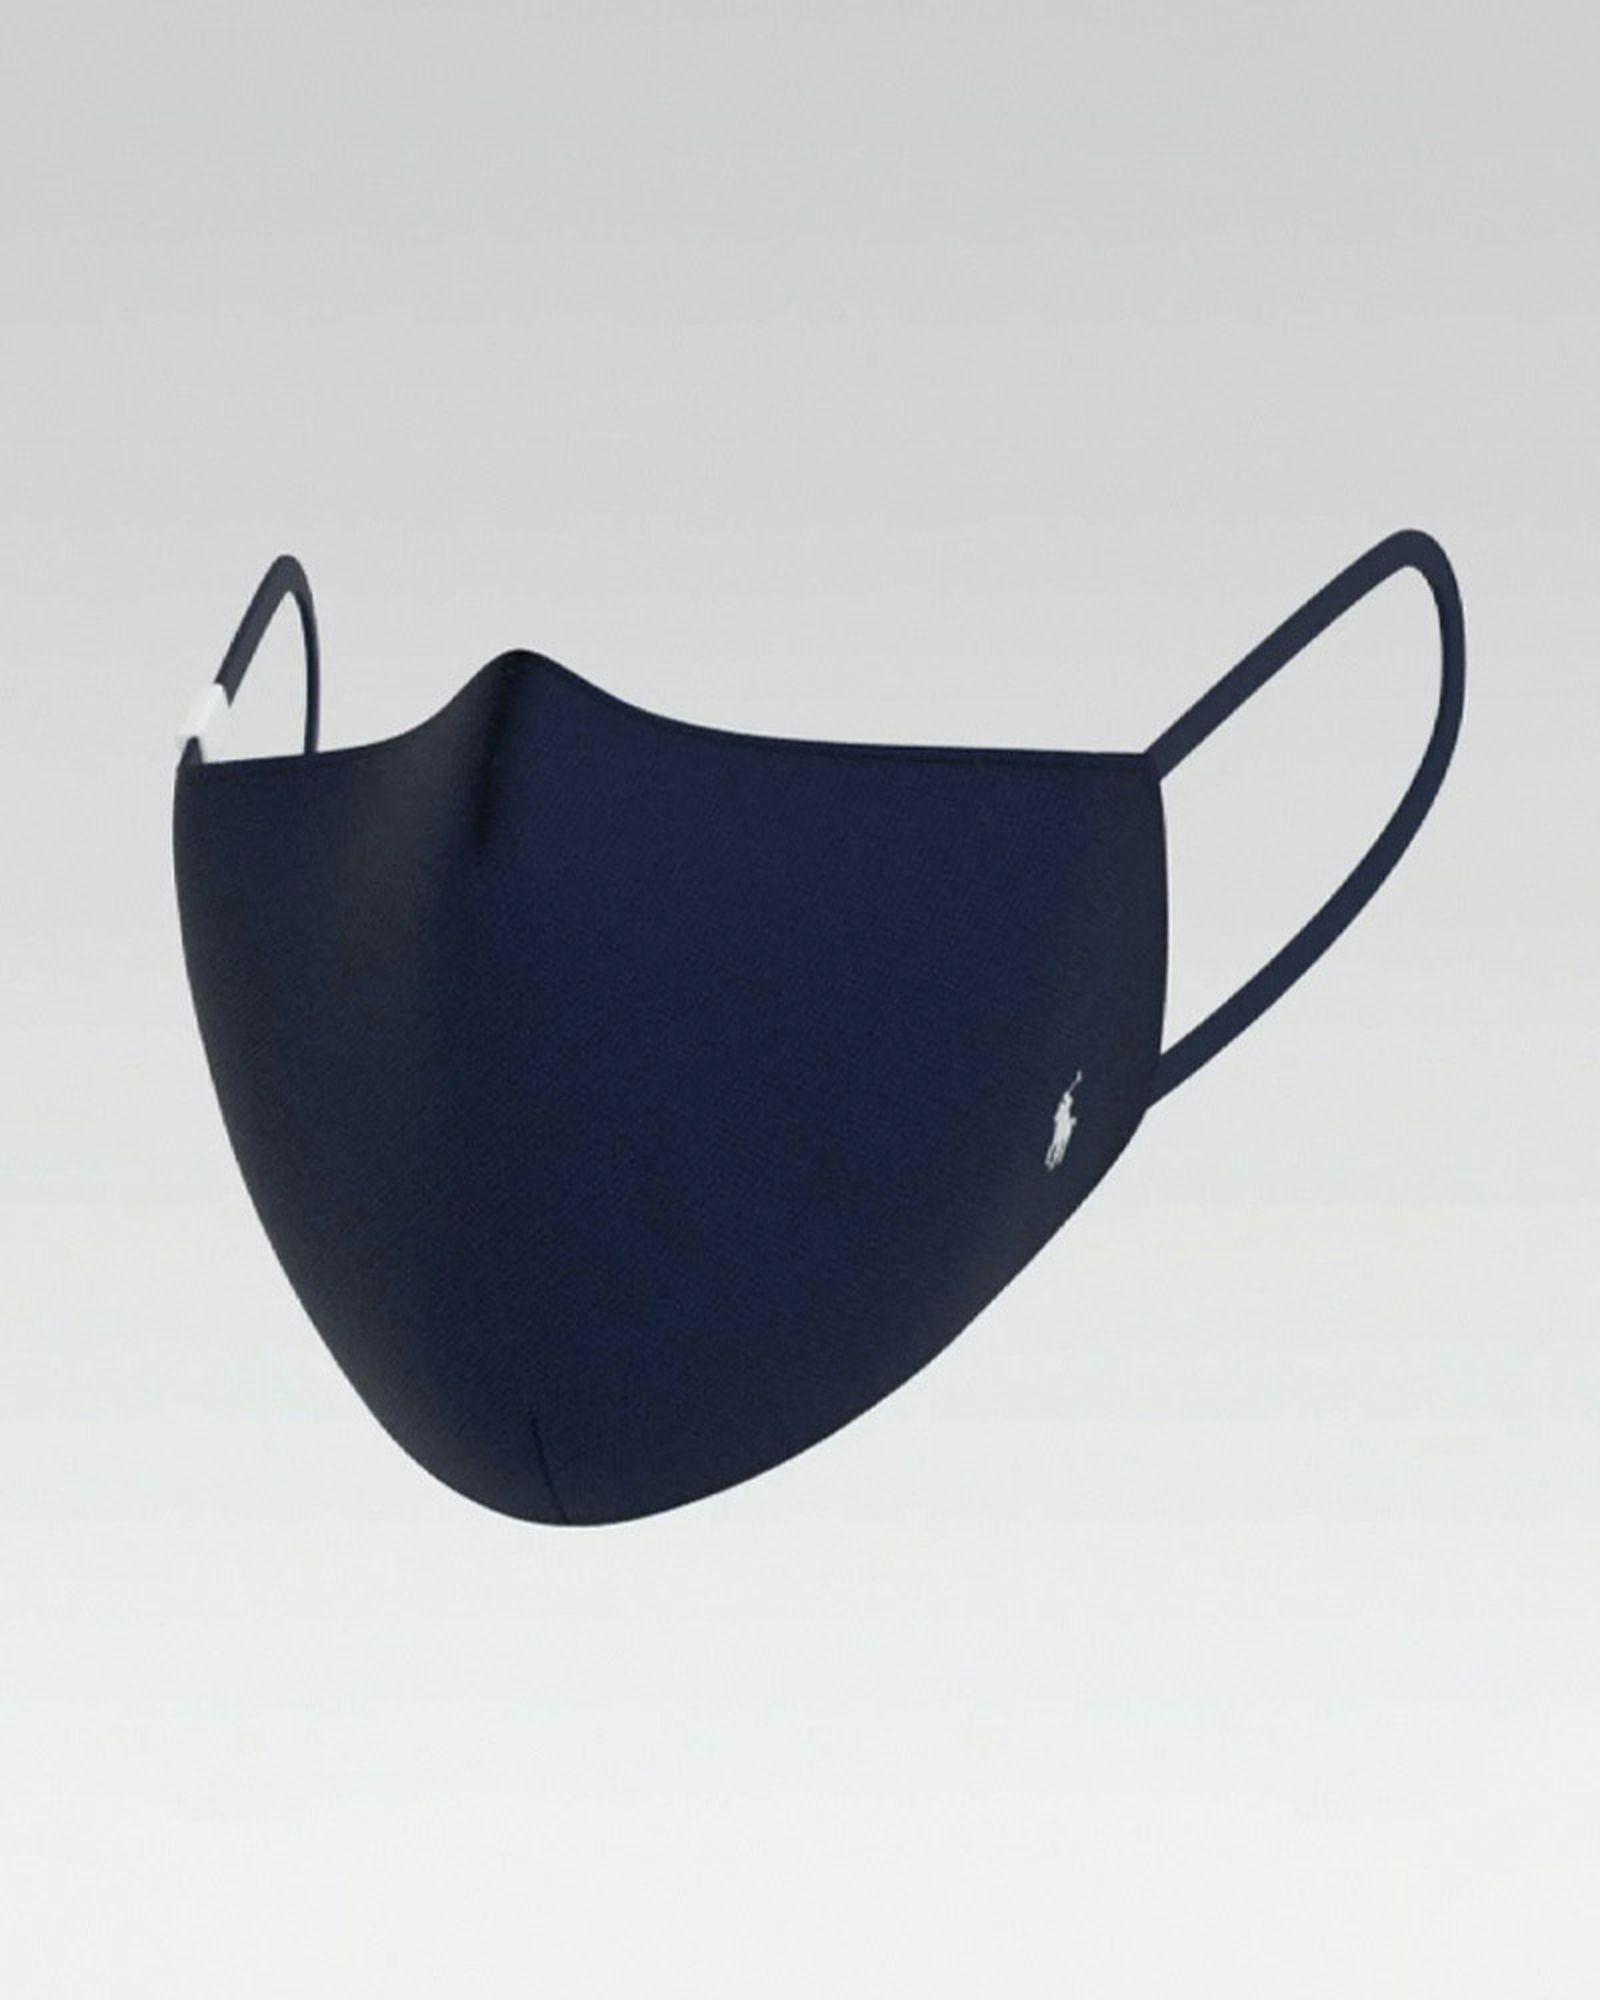 ralph-lauren-face-mask-price-release-date-03